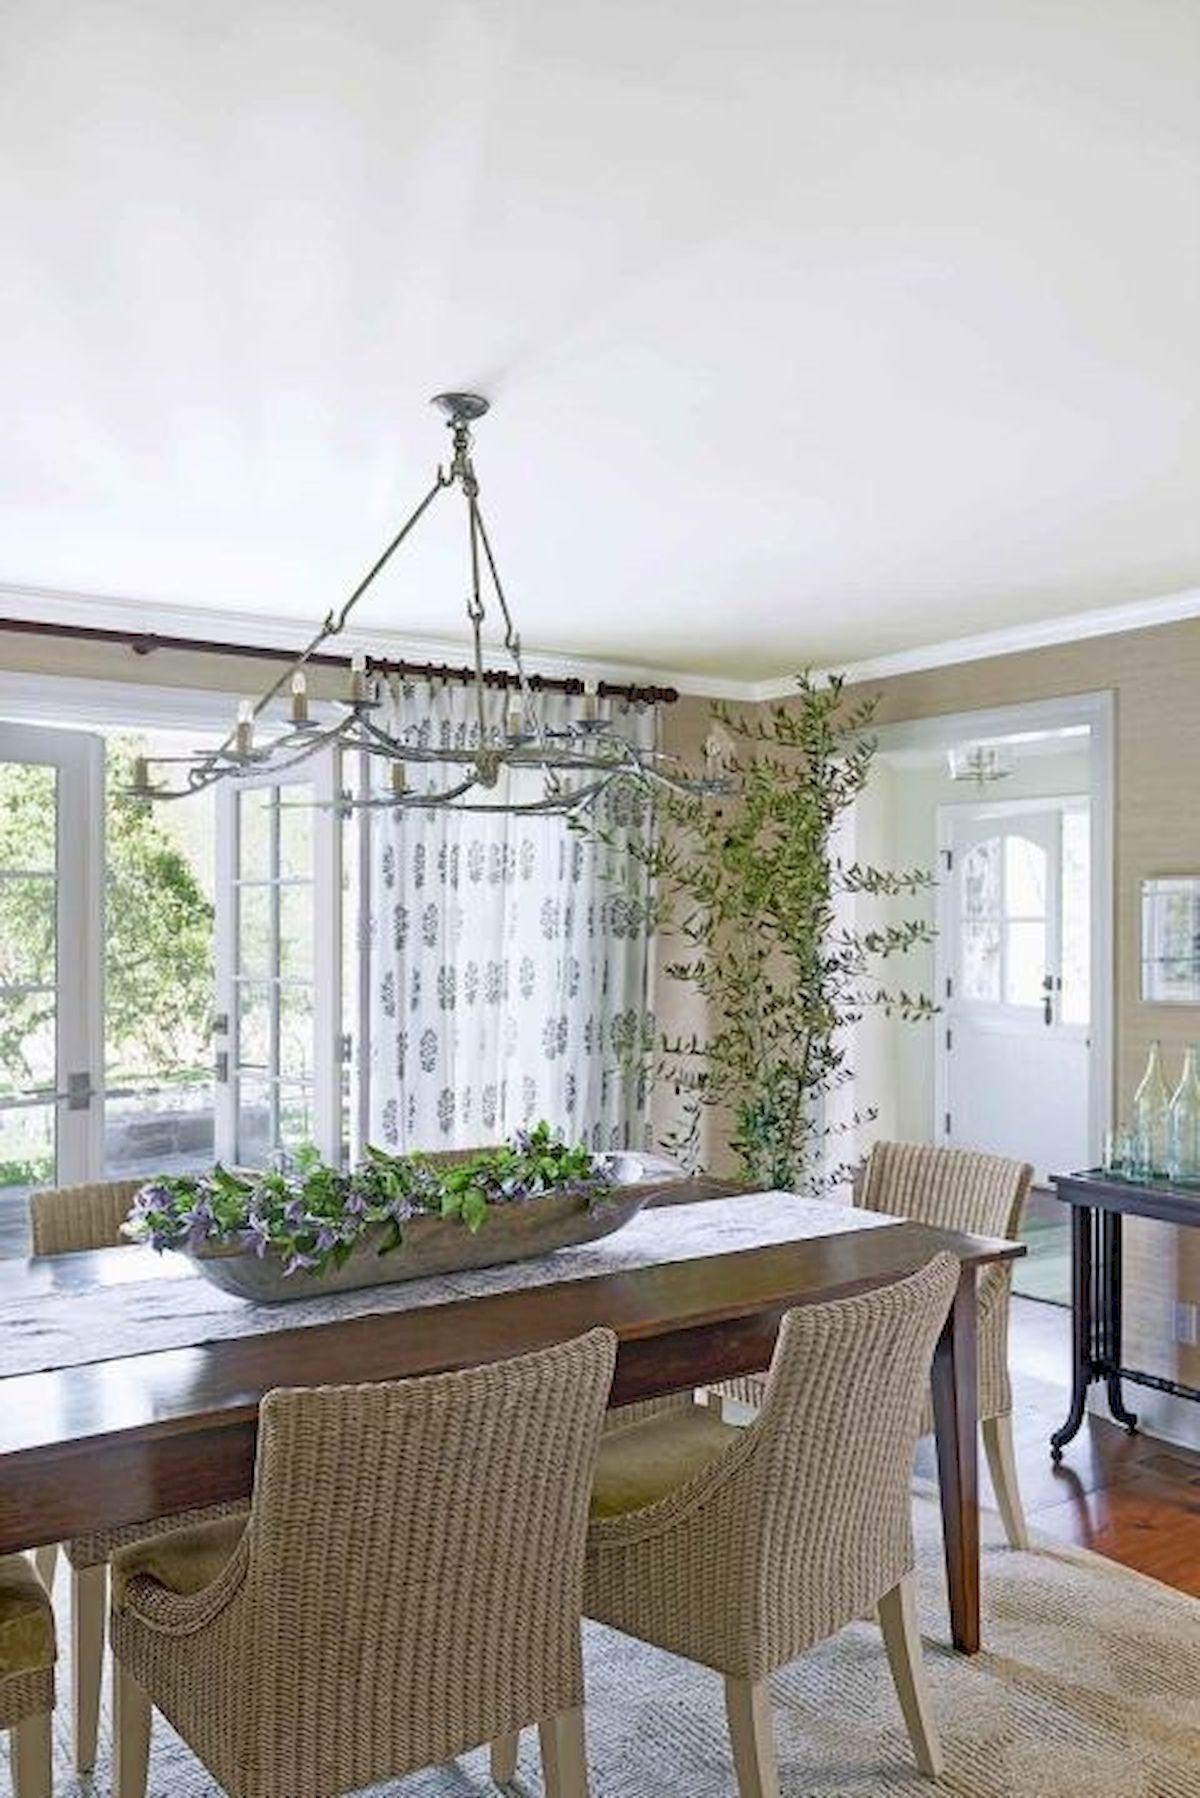 40 Adorable Farmhouse Dining Room Design And Decor Ideas (37)